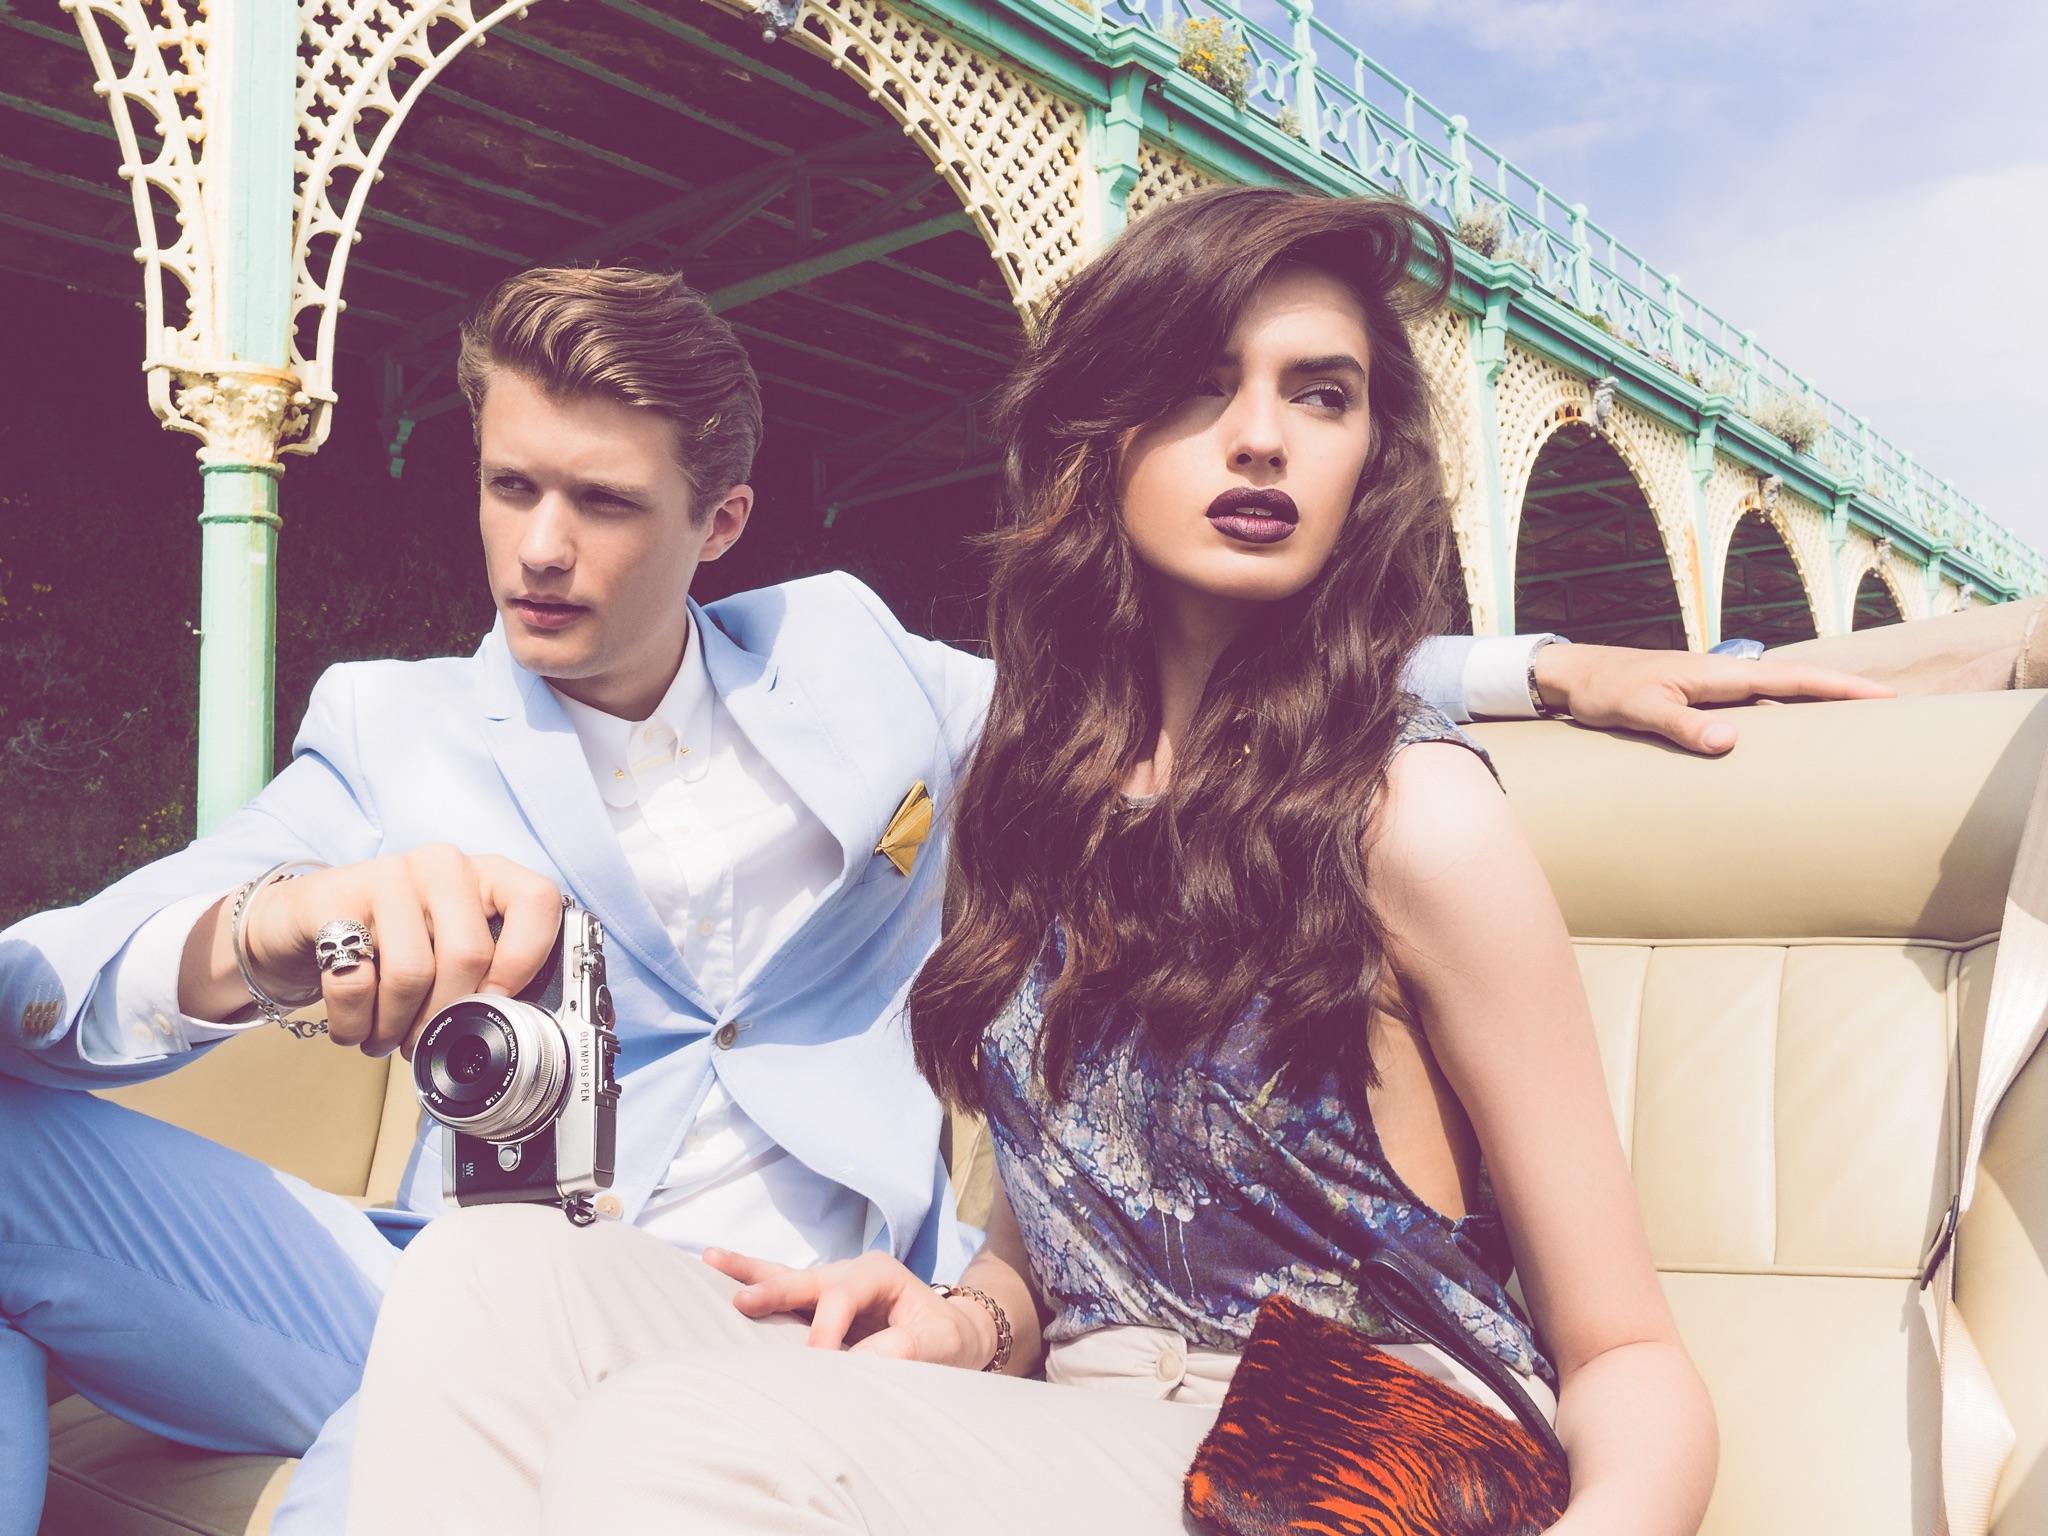 Olympus PEN E-P5 Camera Review Photoshoot Brighton Rolls Royce Fashion Road Trip